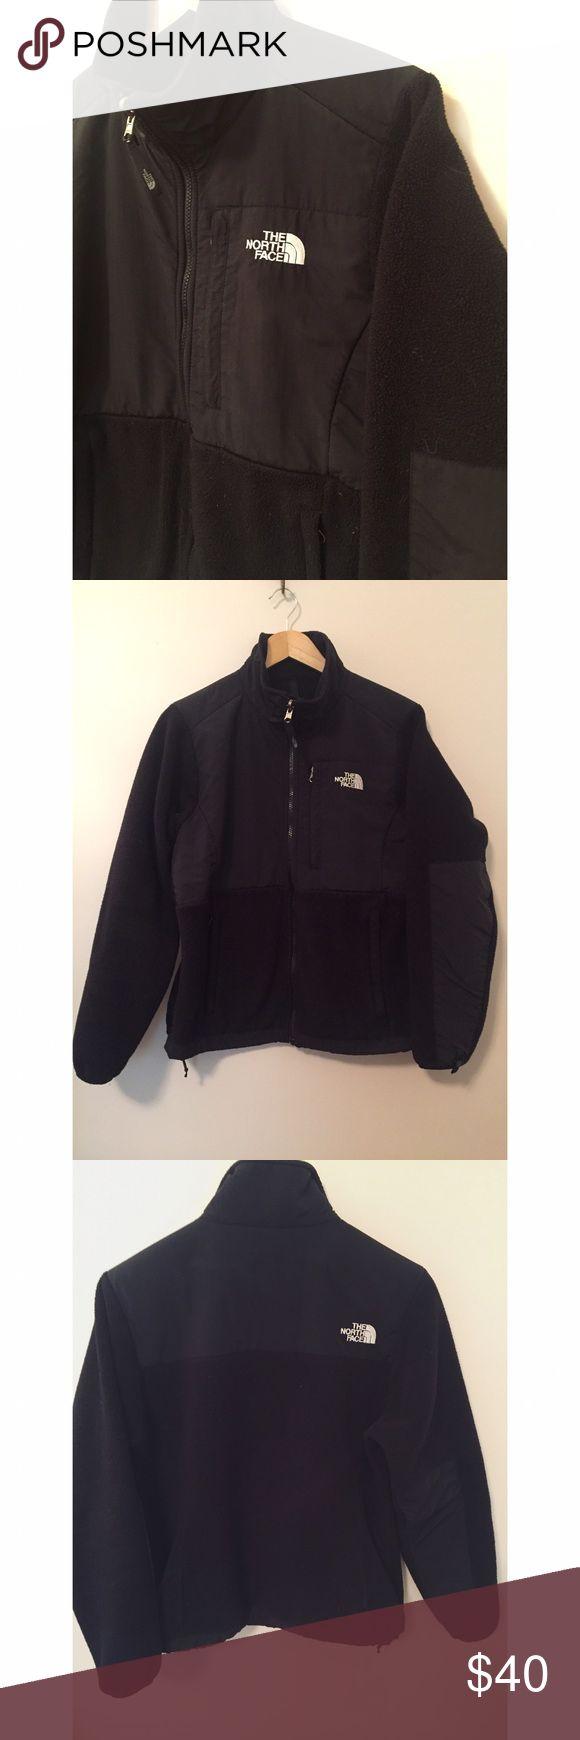 North Face Denali Jacket Black women's North Face Denali fleece jacket, Size M North Face Jackets & Coats